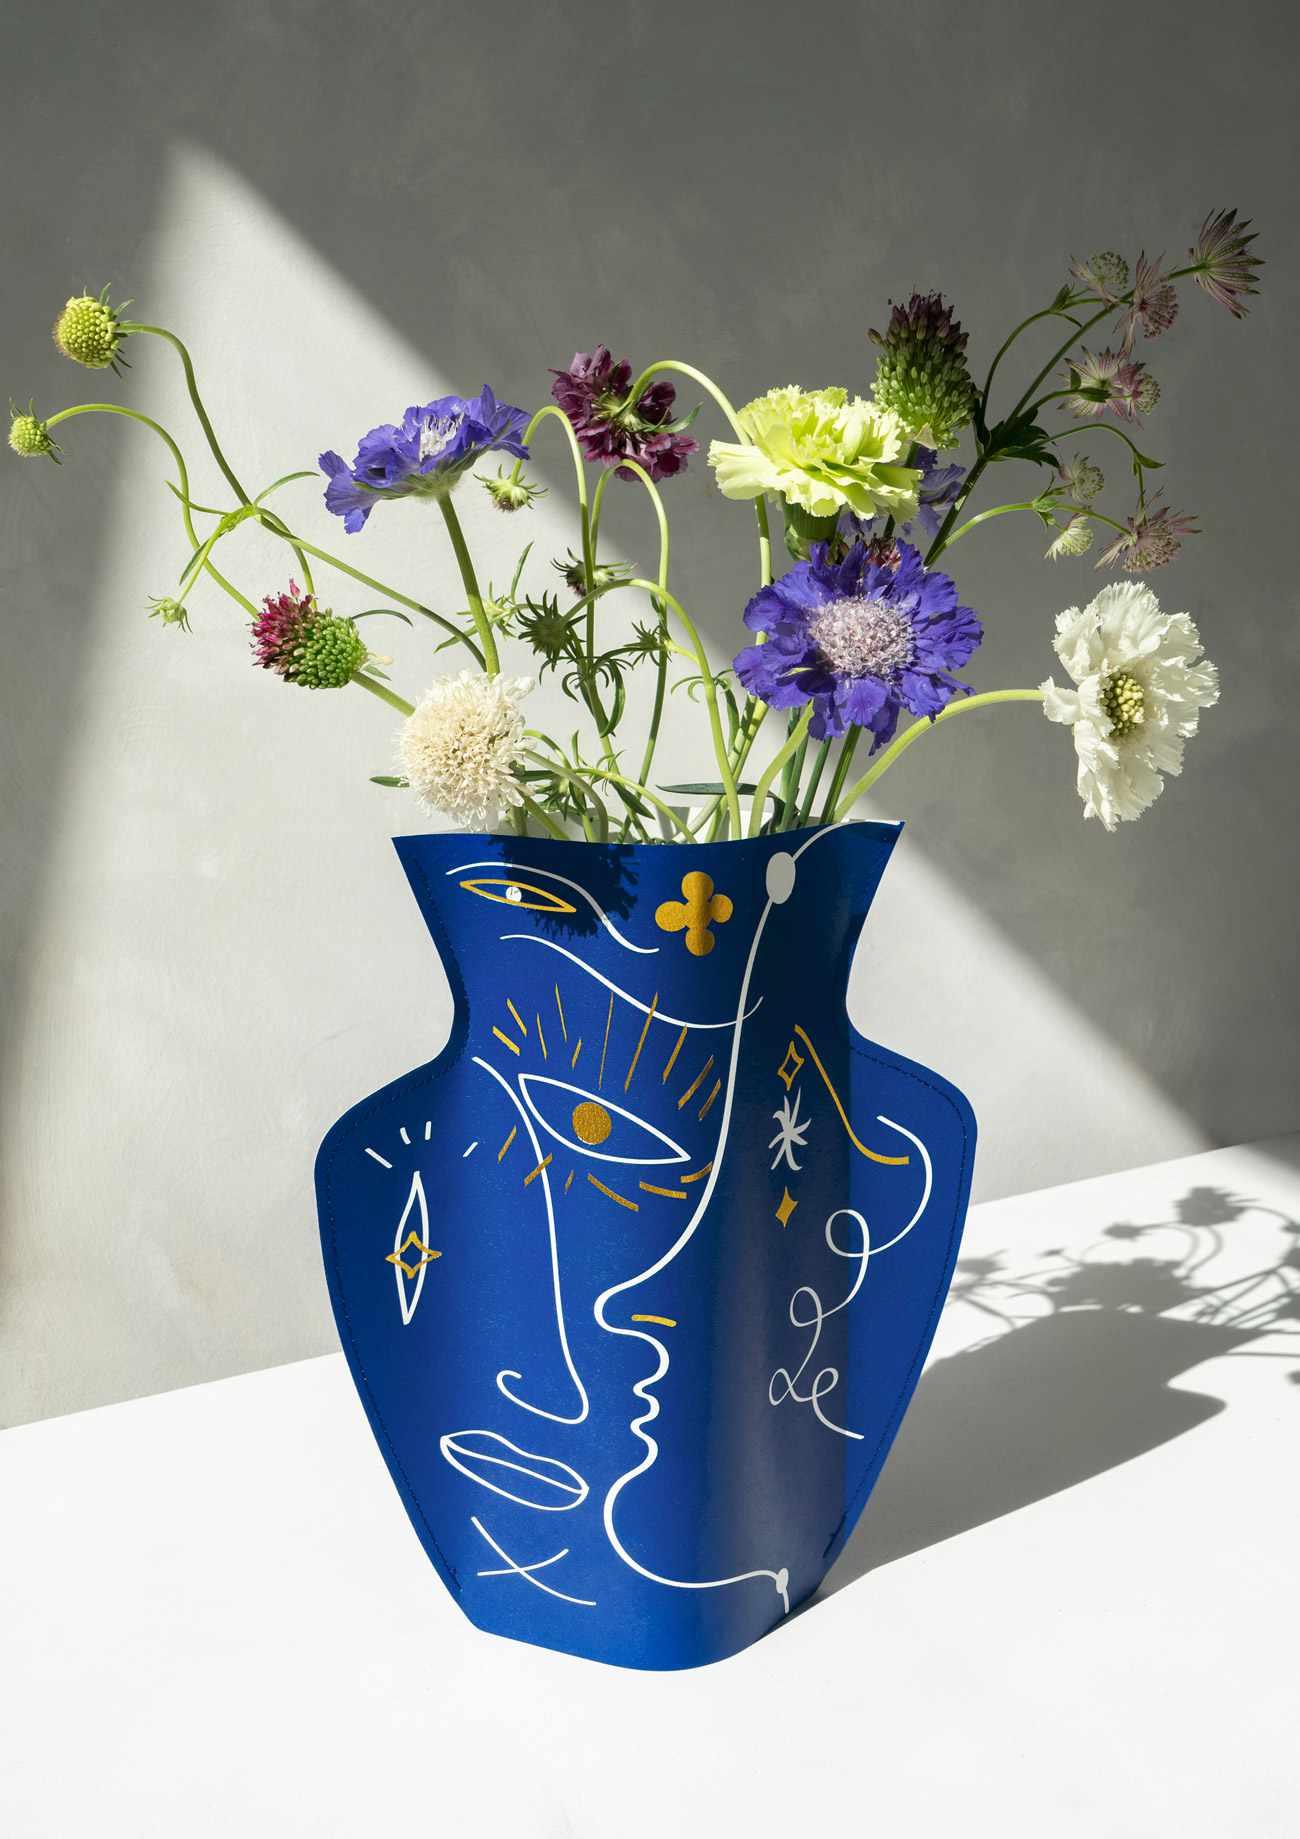 Octaevo Jaime Hayon Paper Vase